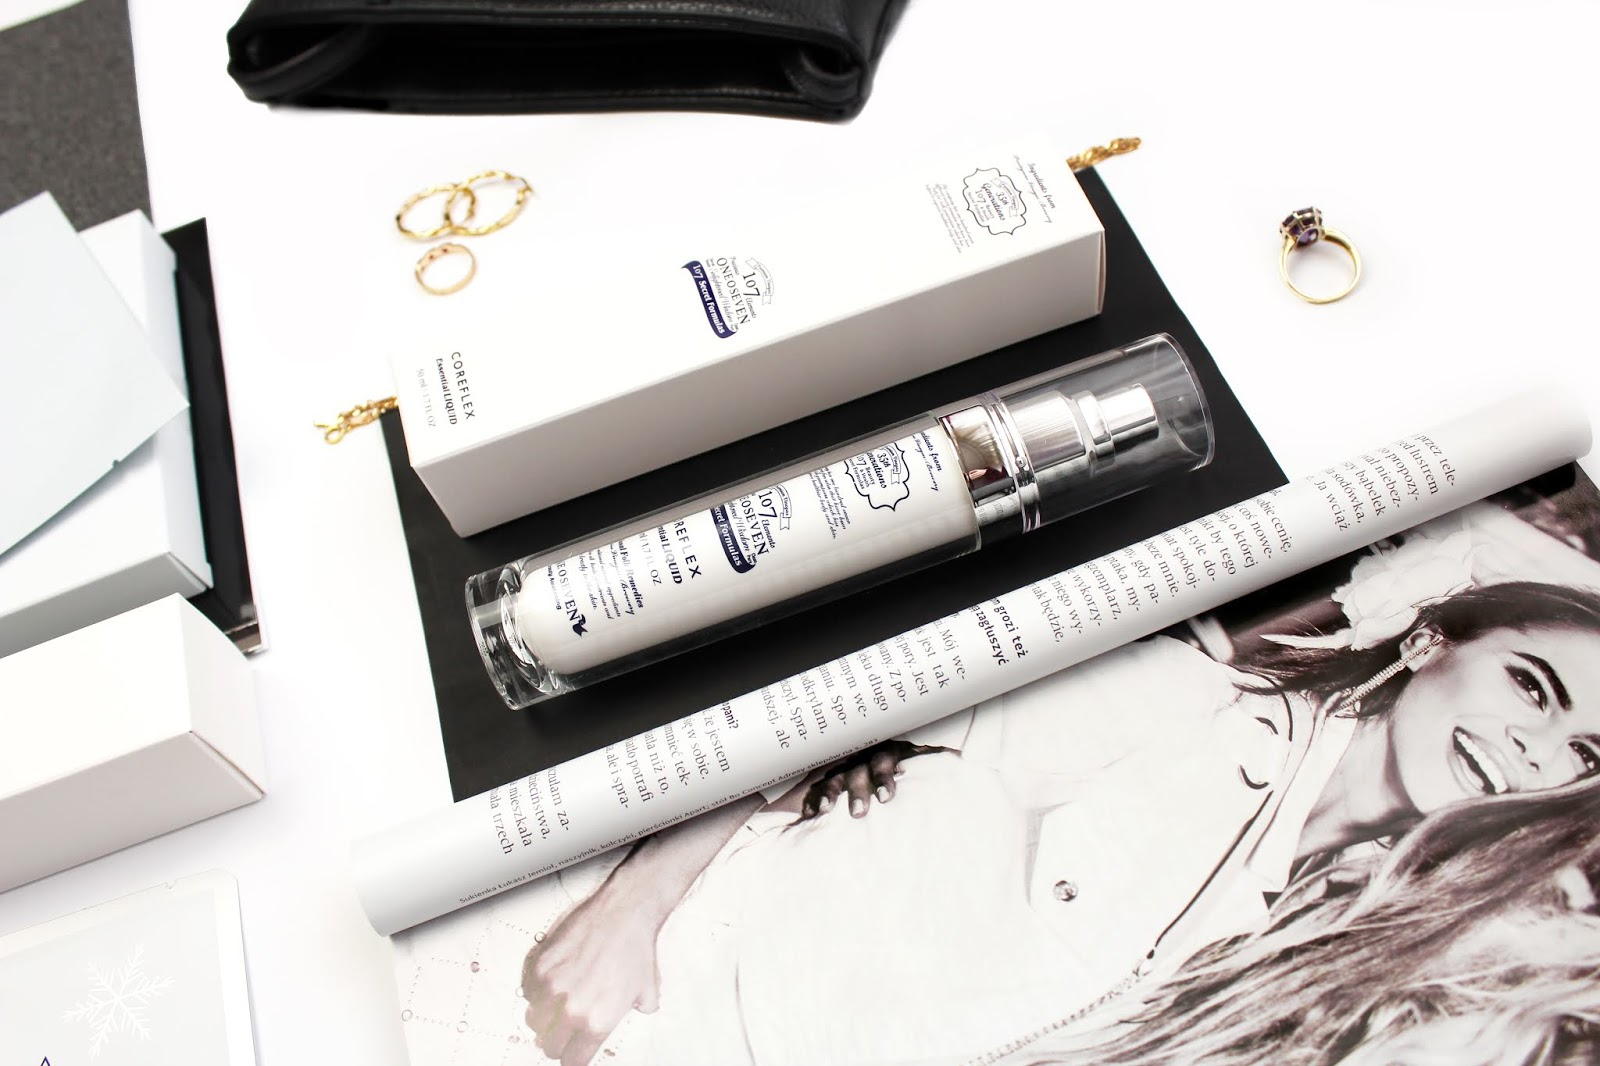 107 Oneoseven, Coreflex Essential Liquid